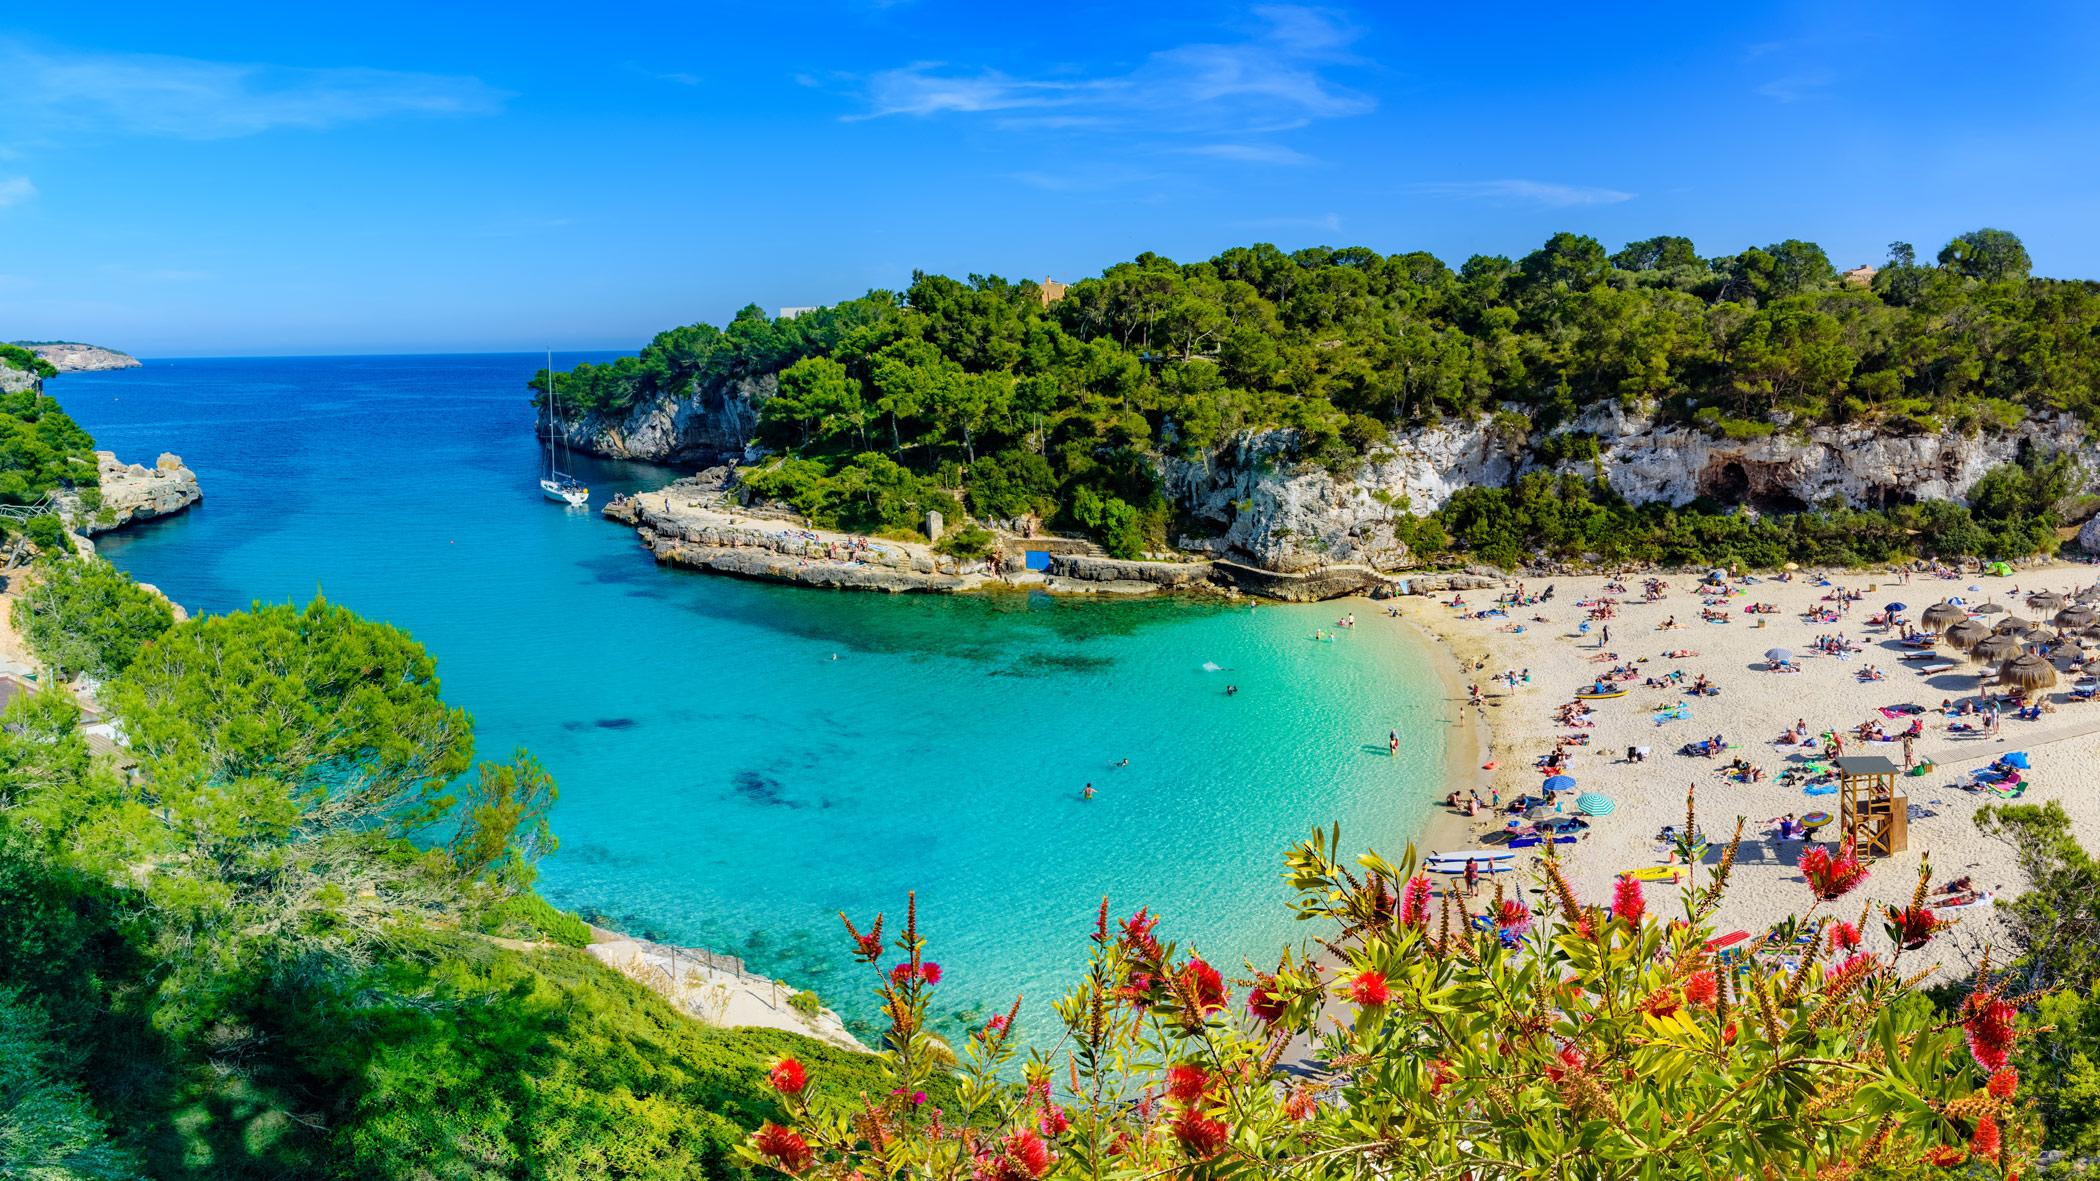 Mallorca se une a la Red de Observatorios de Turismo Sostenible de la OMT